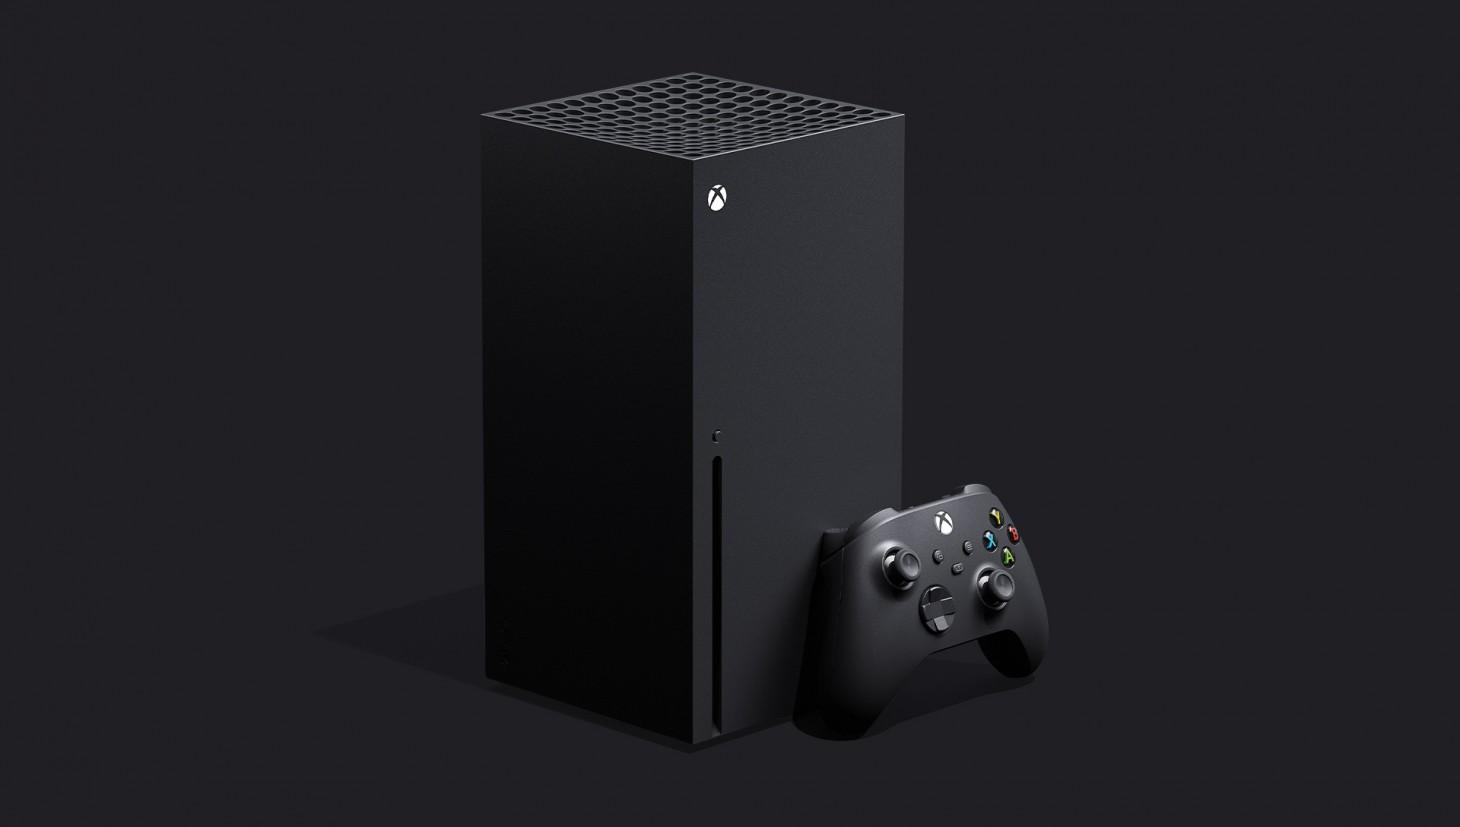 Xbox Series X выходит 10 ноября по цене $499